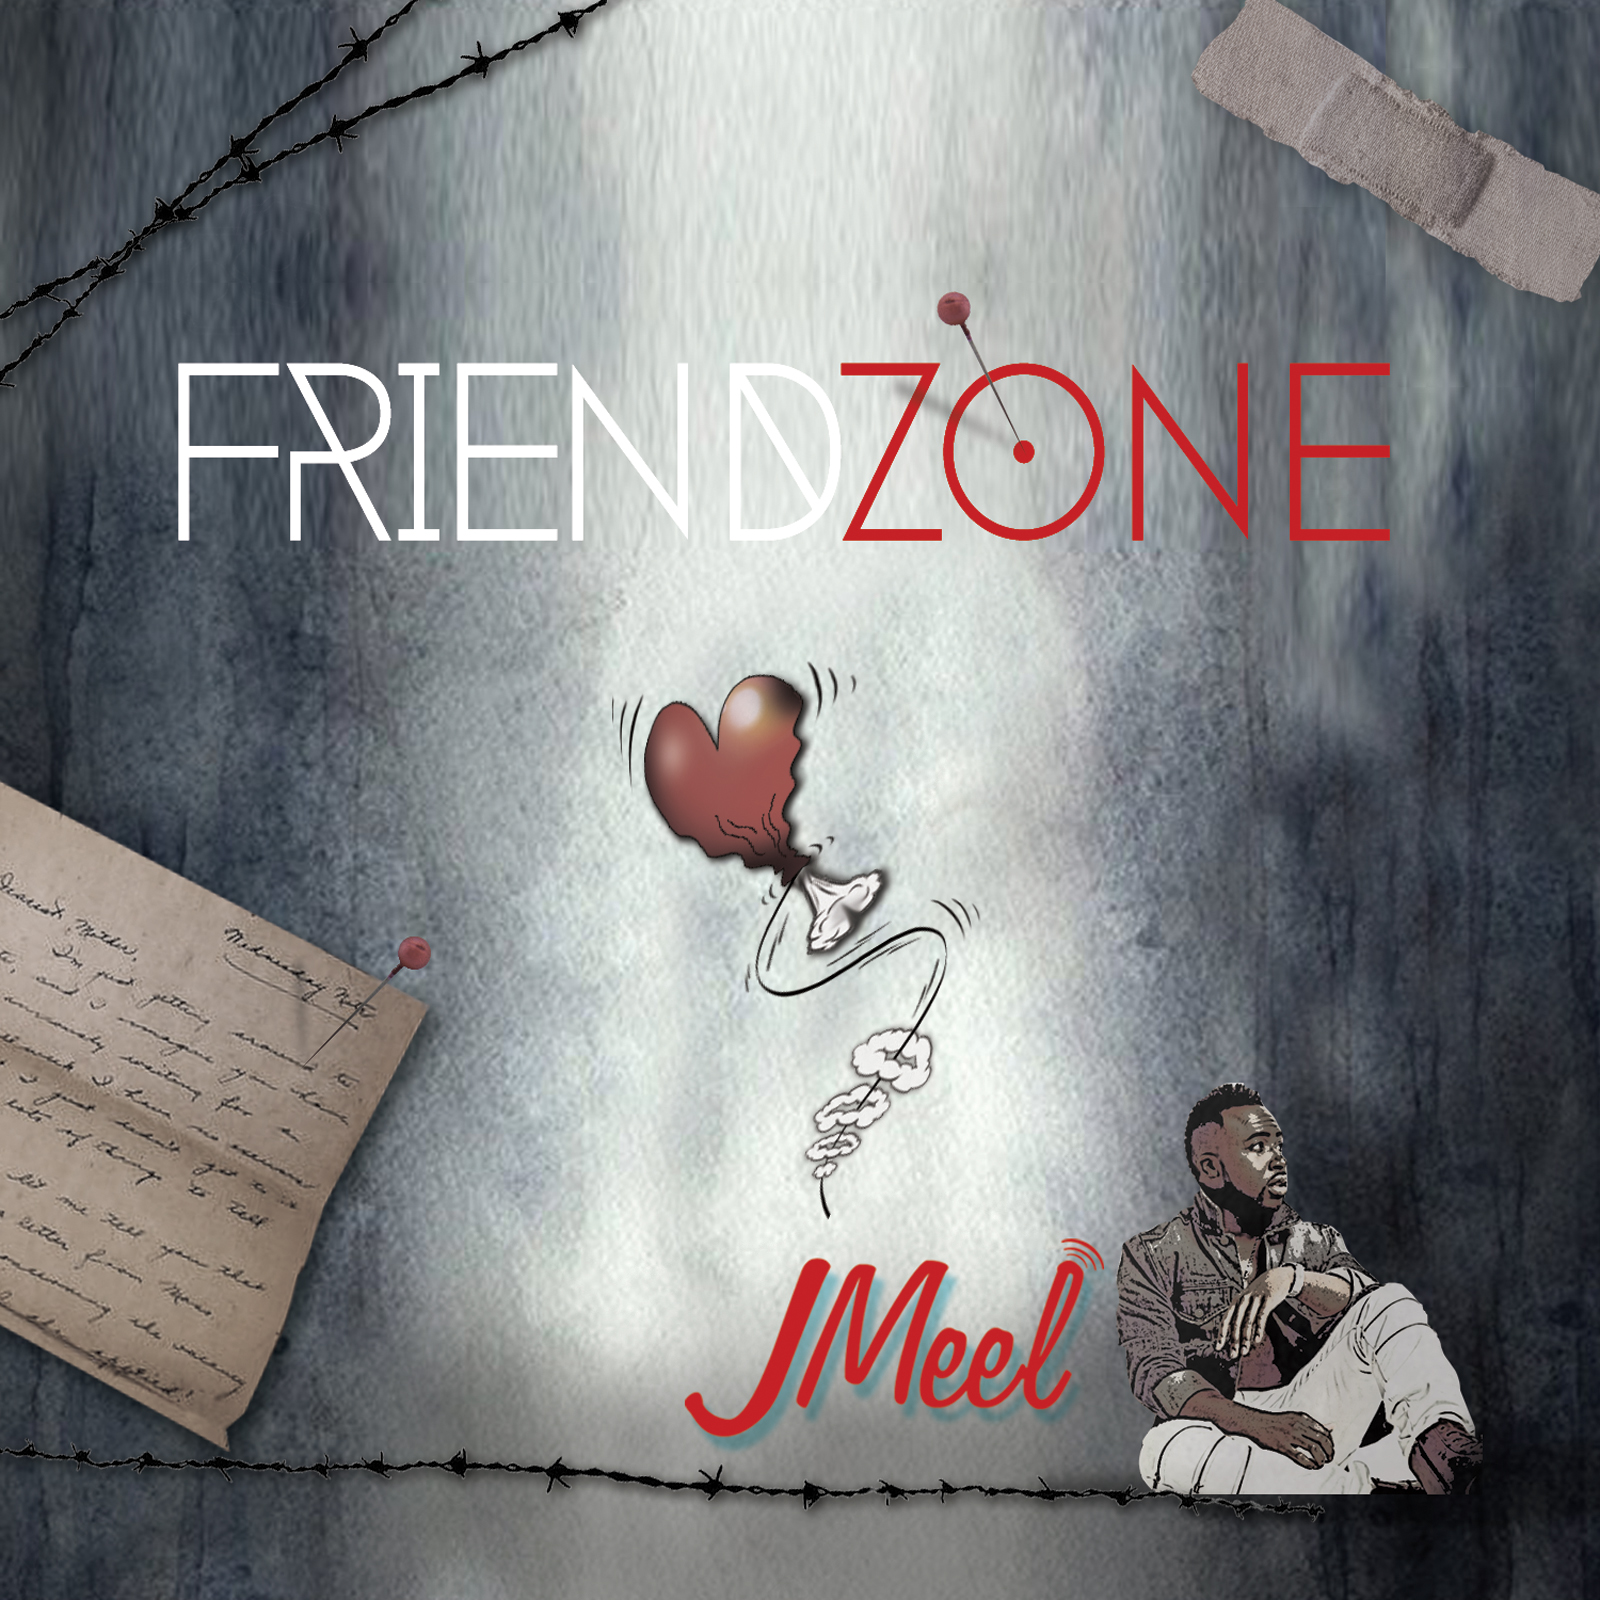 jmeel_friendzone_HiRes.jpg